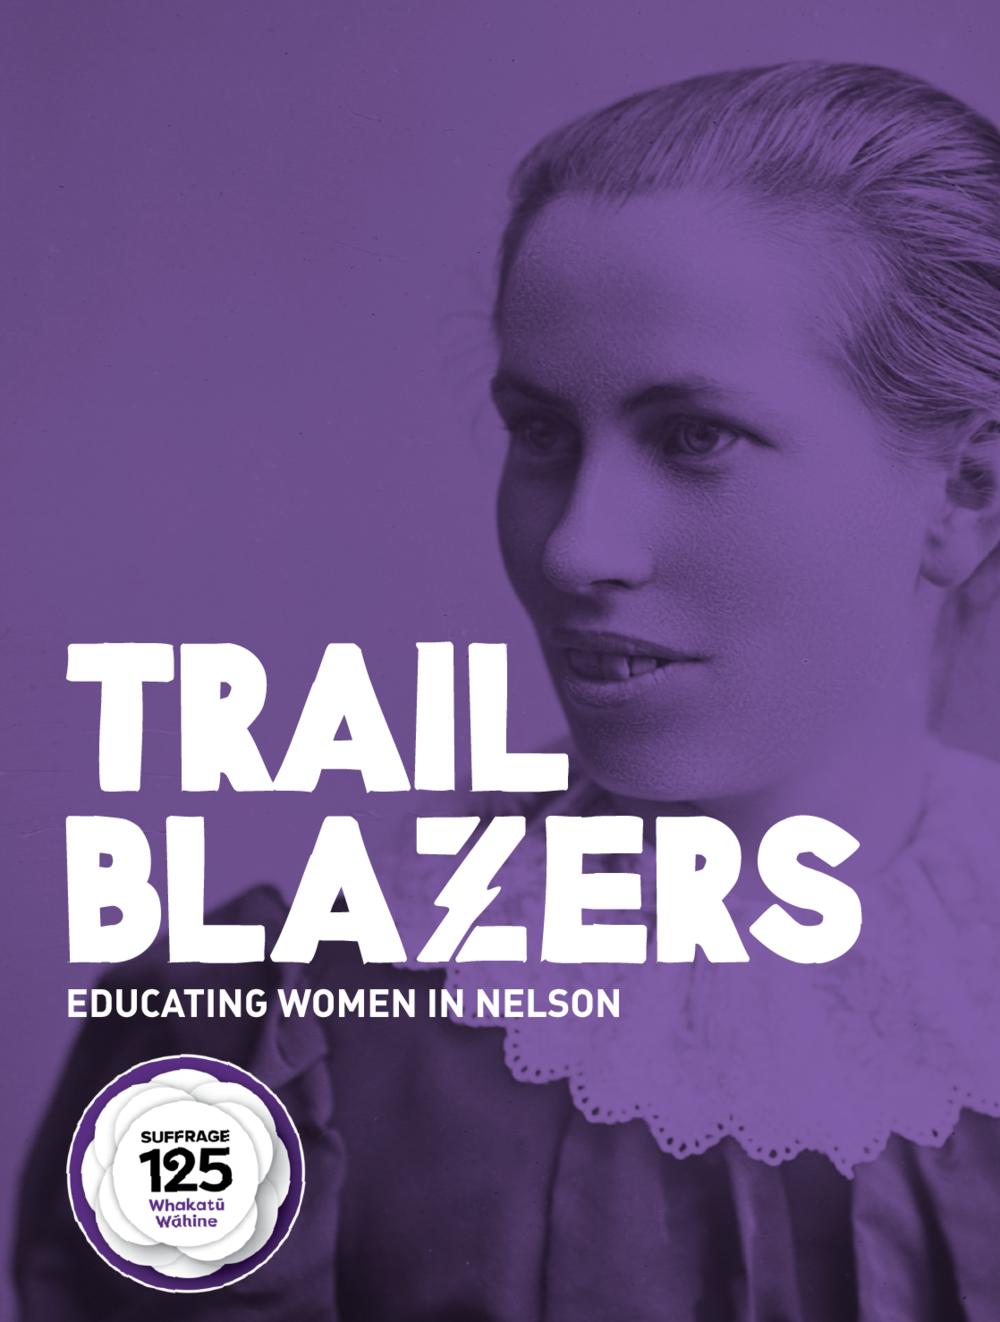 trailblazers-02.png